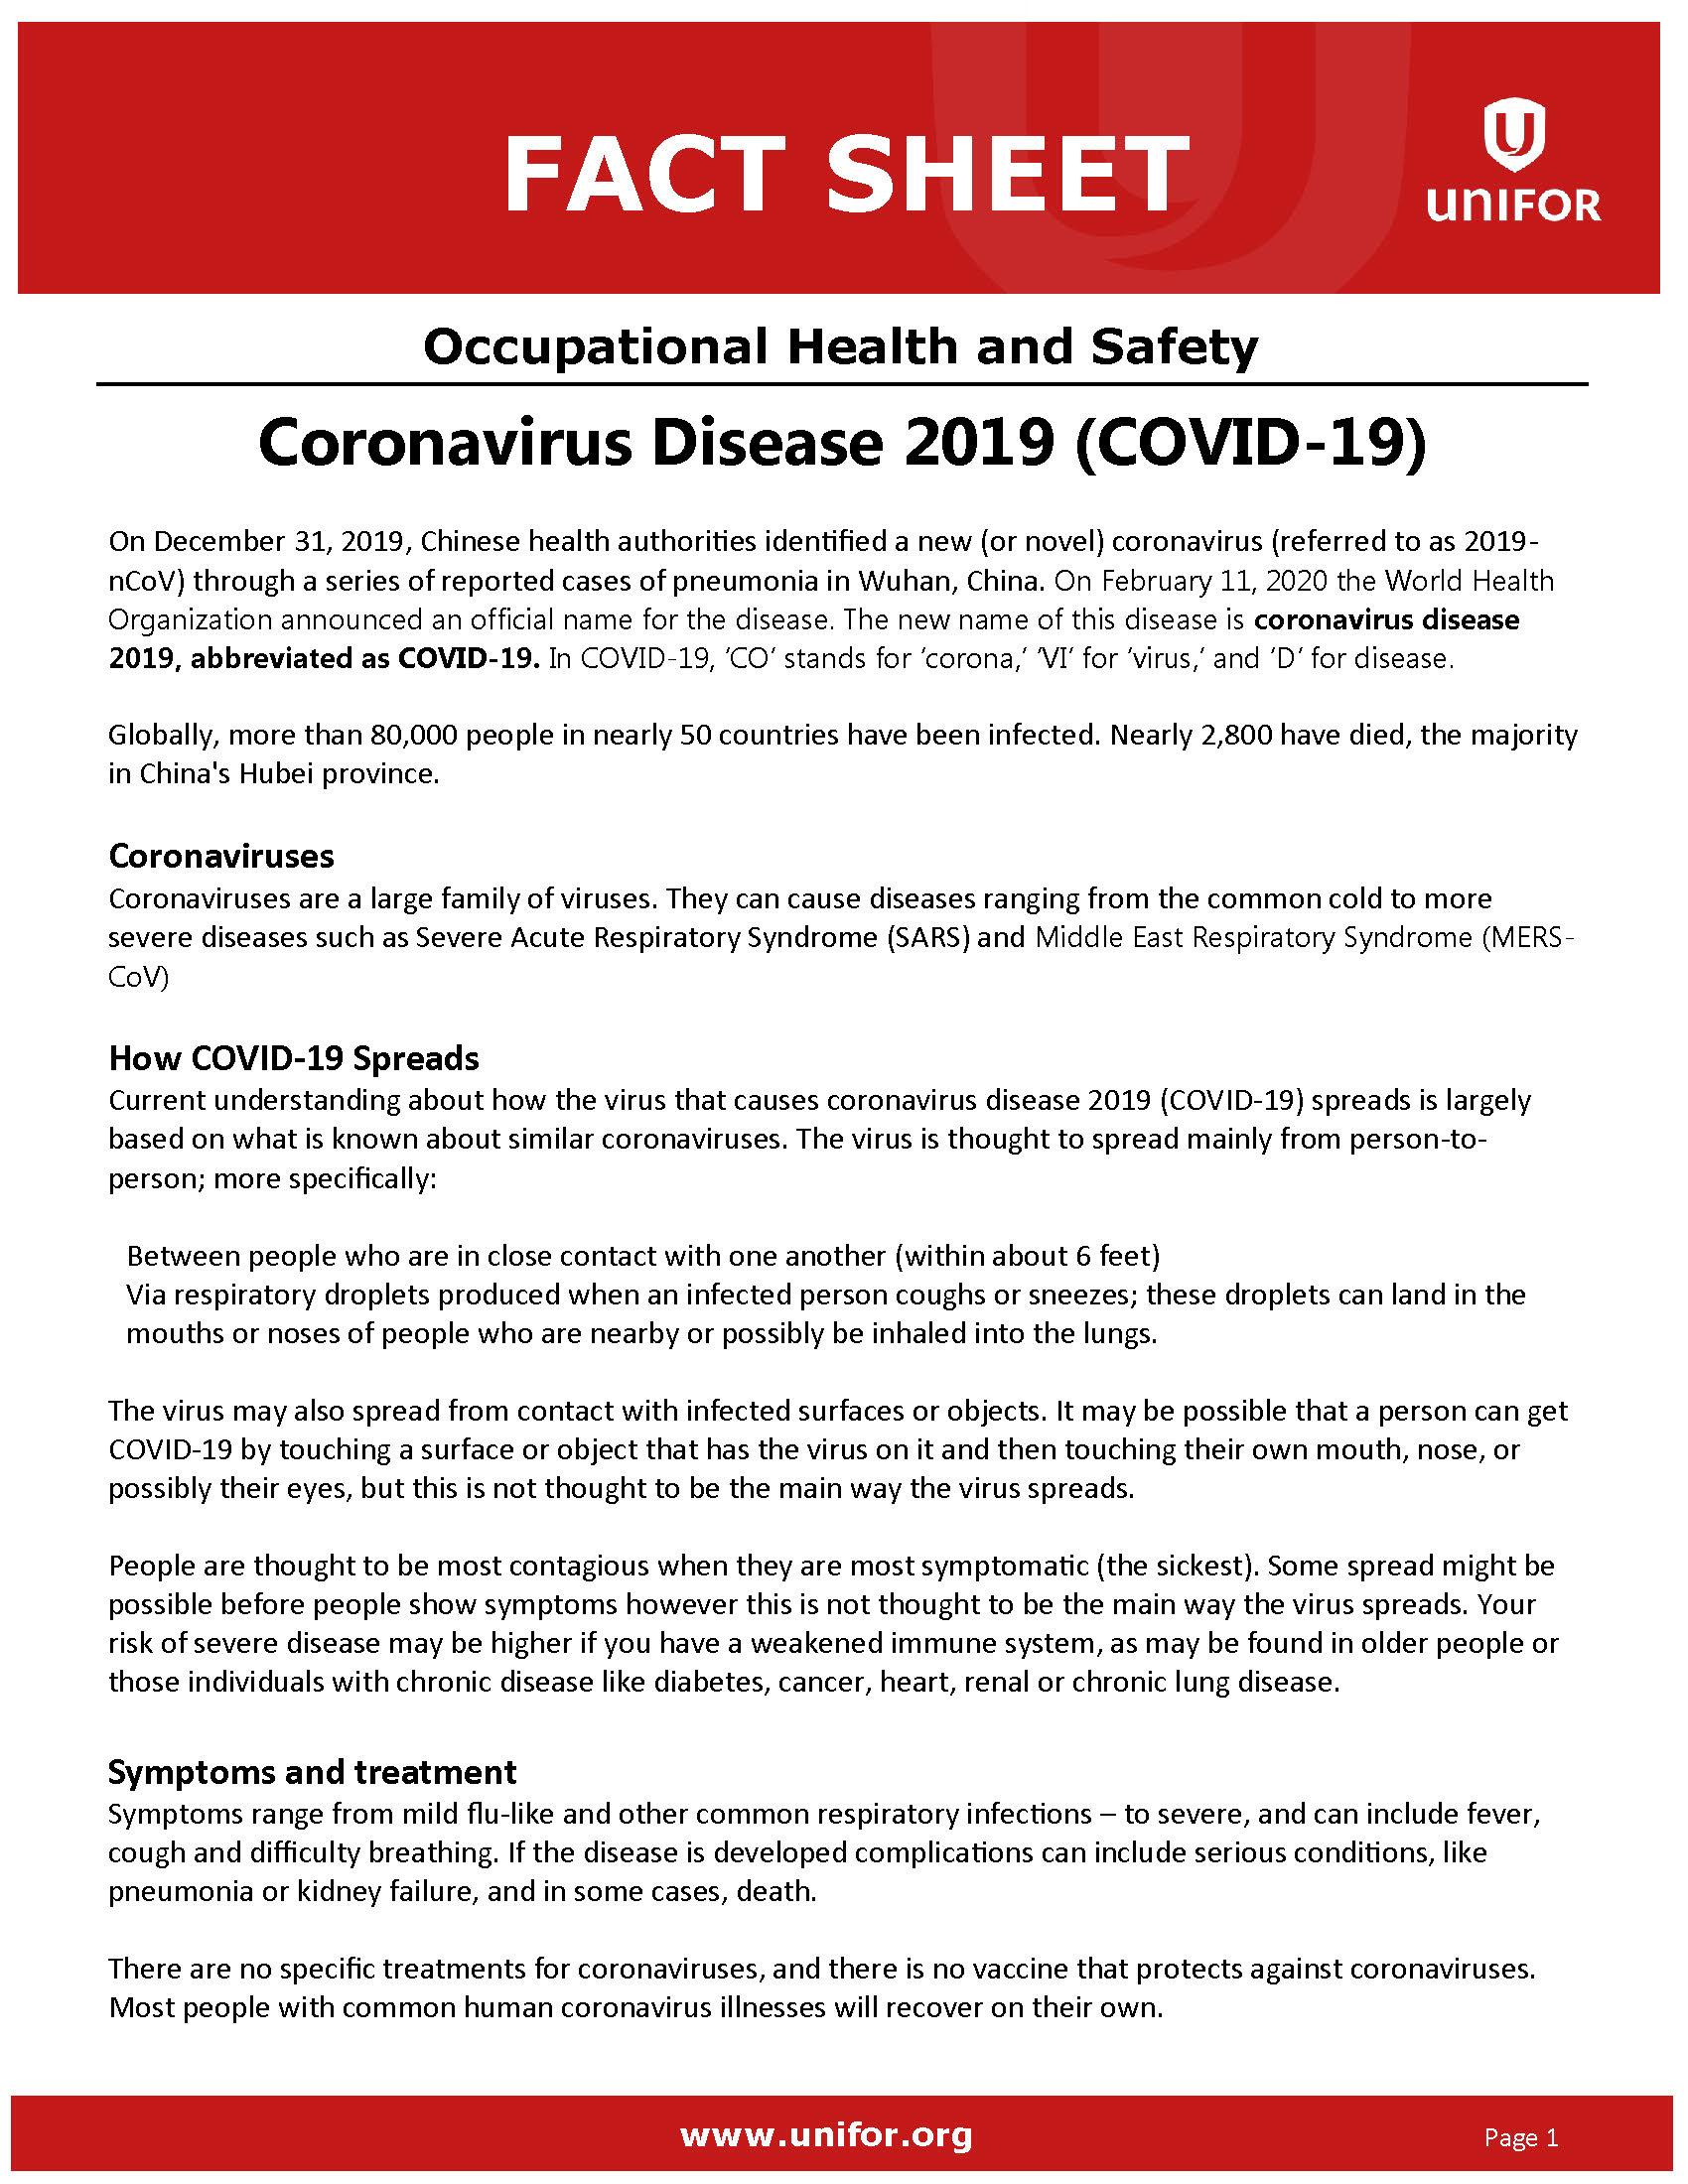 Coronavirus - Fact Sheet 2020 Mar. 13_Page_1